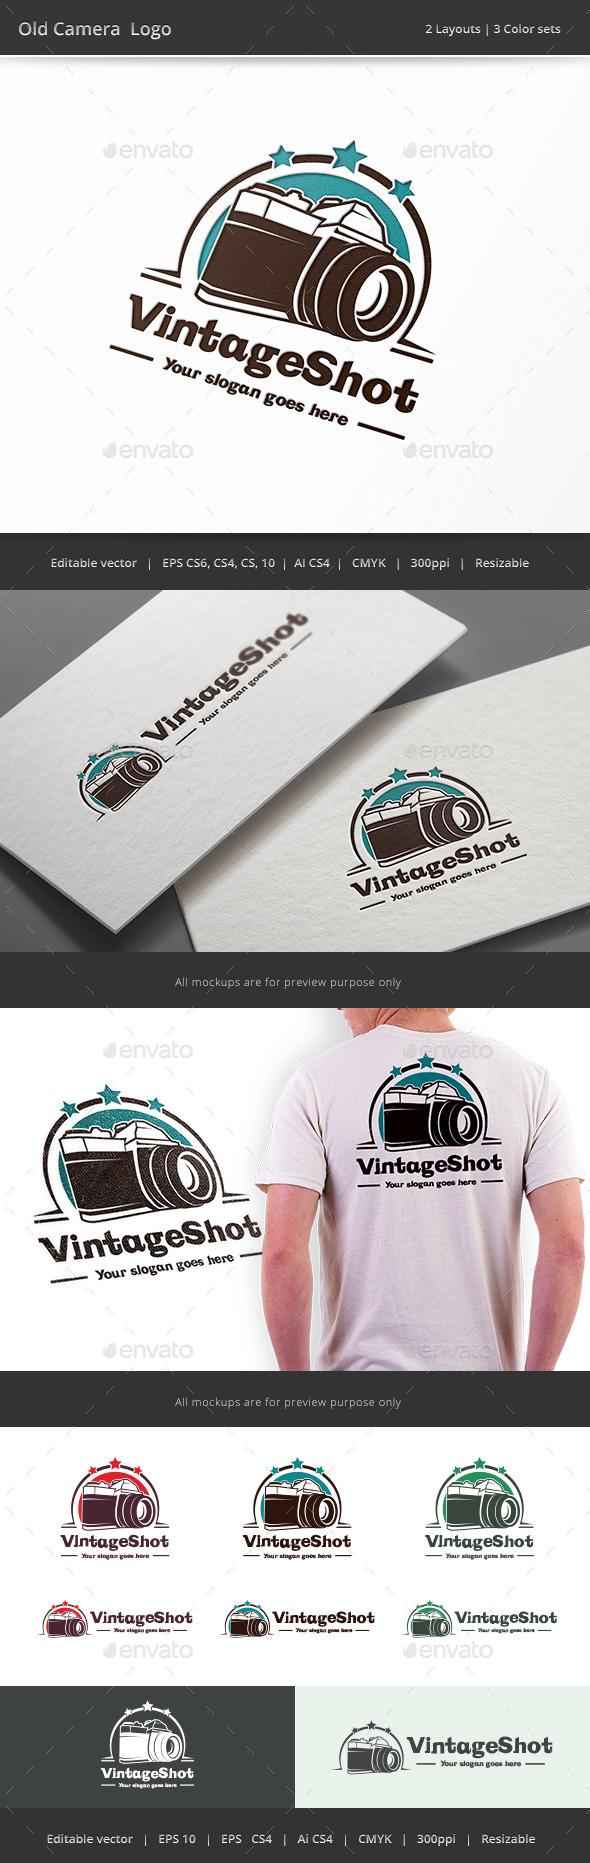 Old Camera Logo - Objects Logo Templates